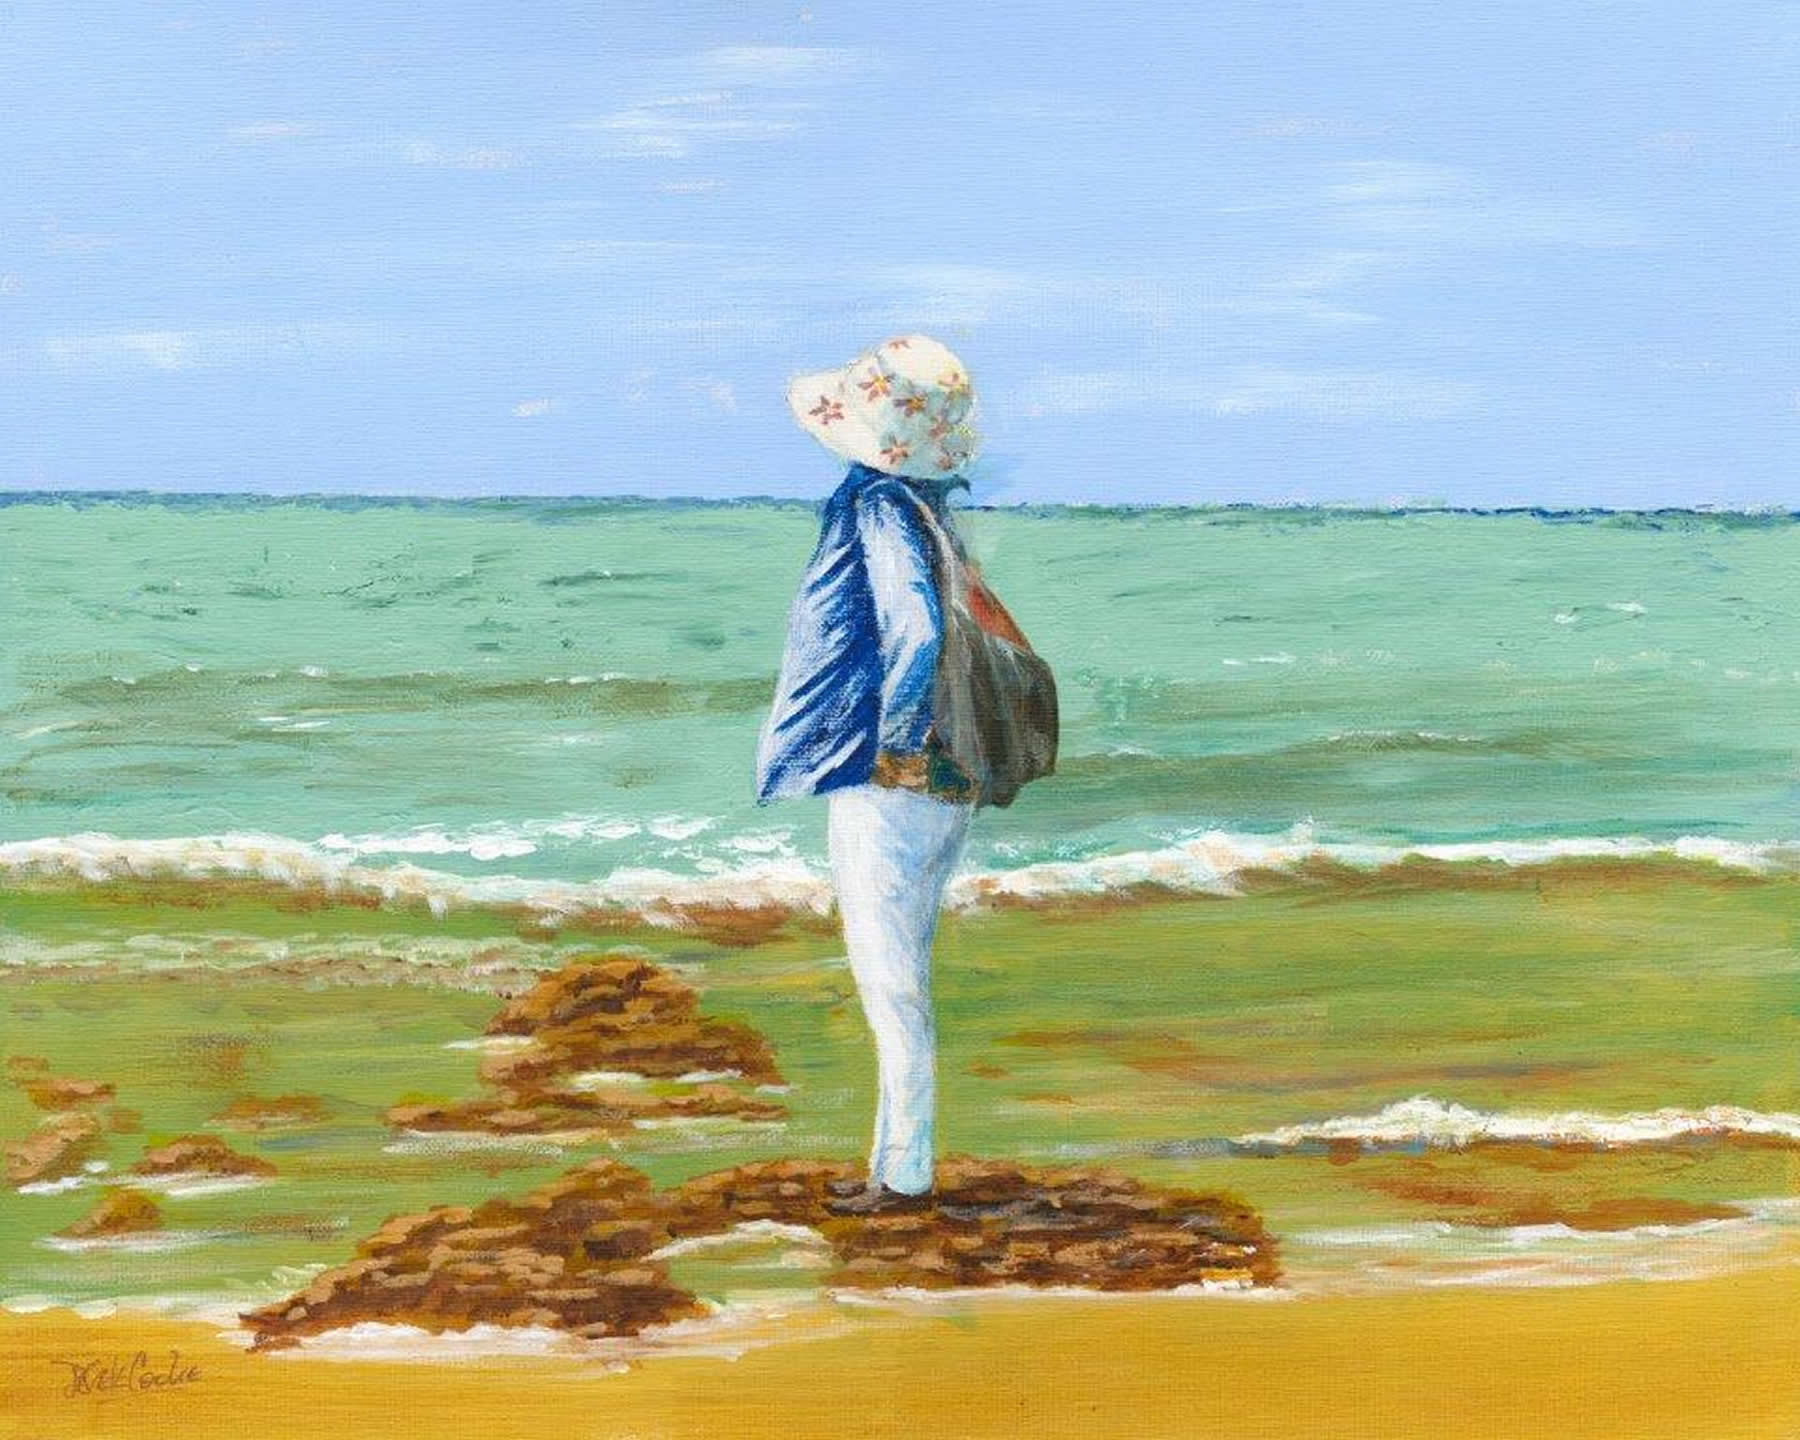 Watching the Waves - Beach View Fine Art Print